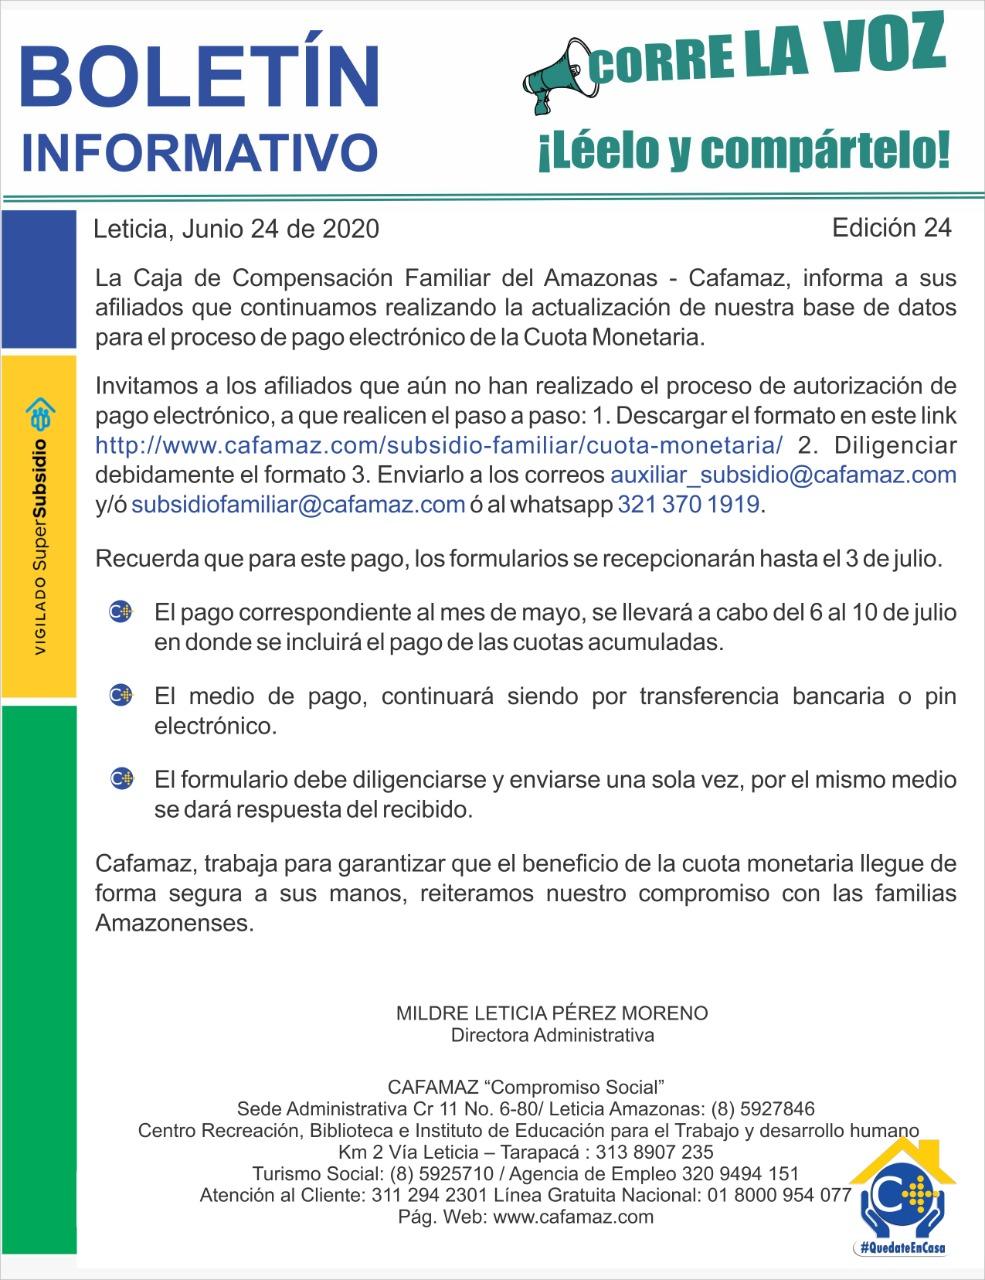 Boletín Informativo Edición 24 | Cafamaz, 2020